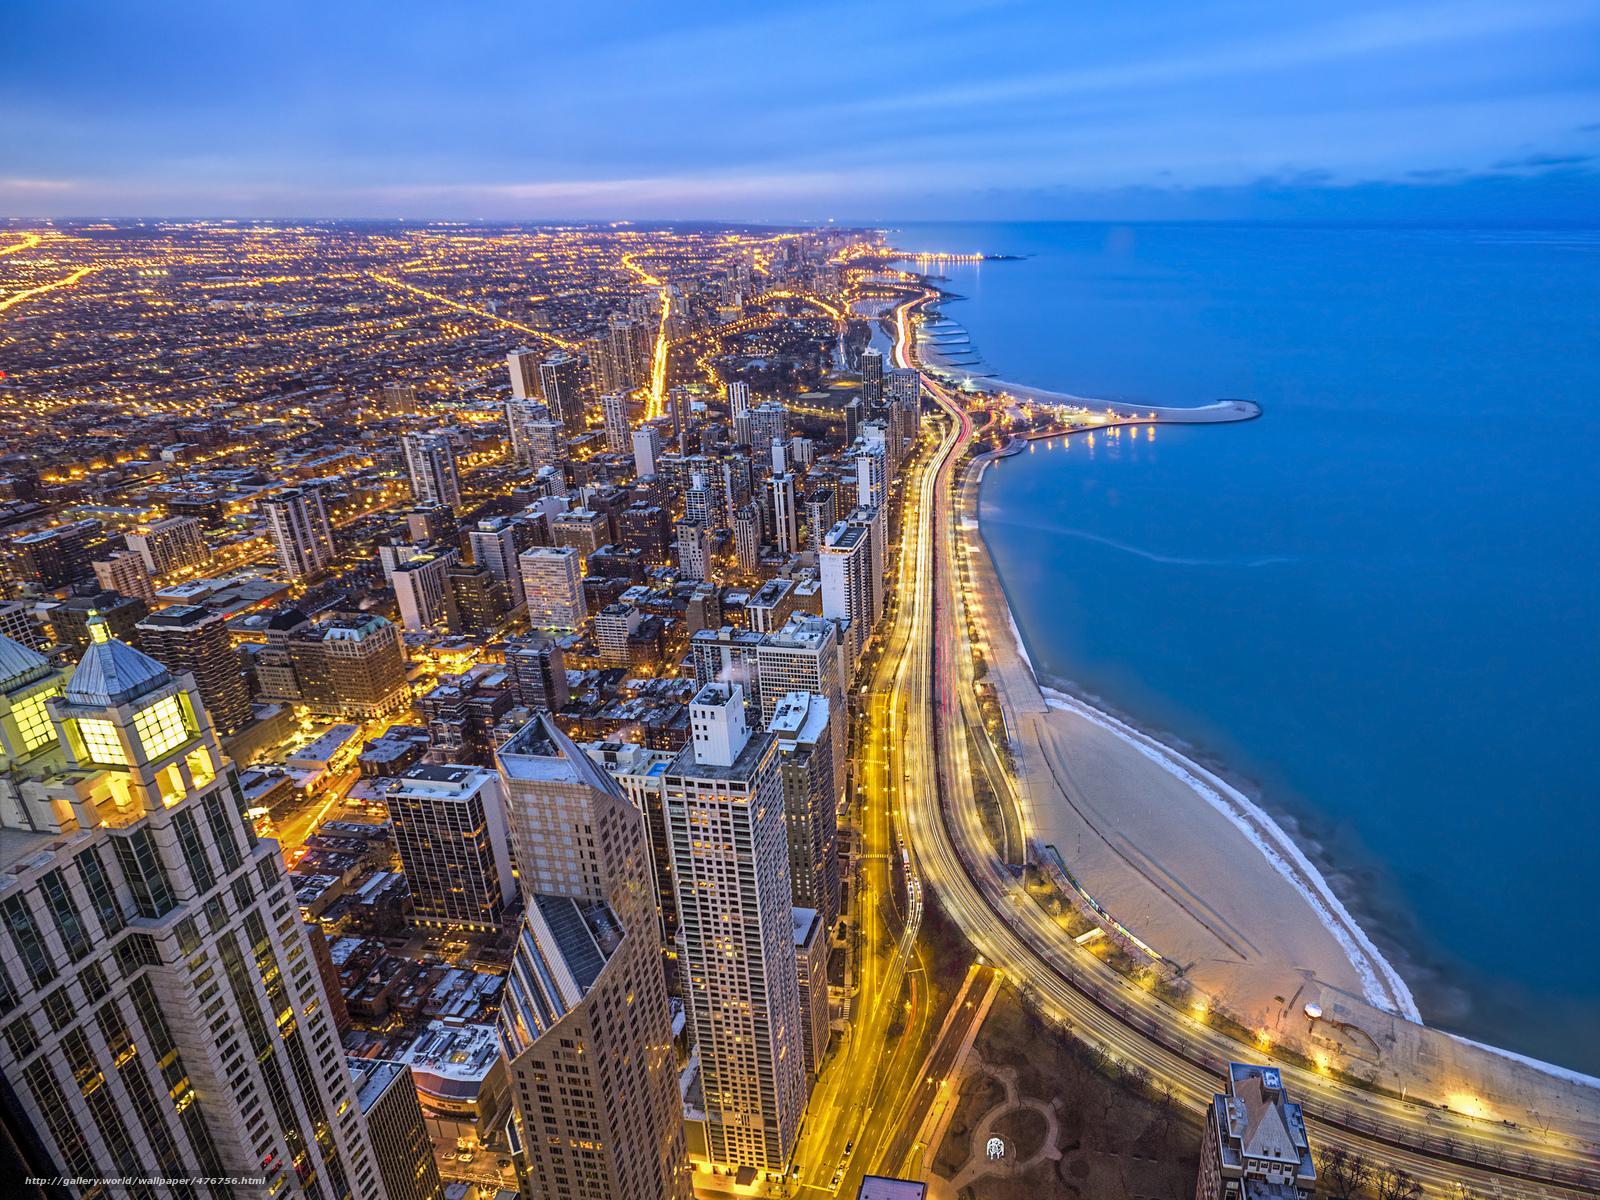 Download wallpaper Chicago illinois lake shore drive 1600x1200